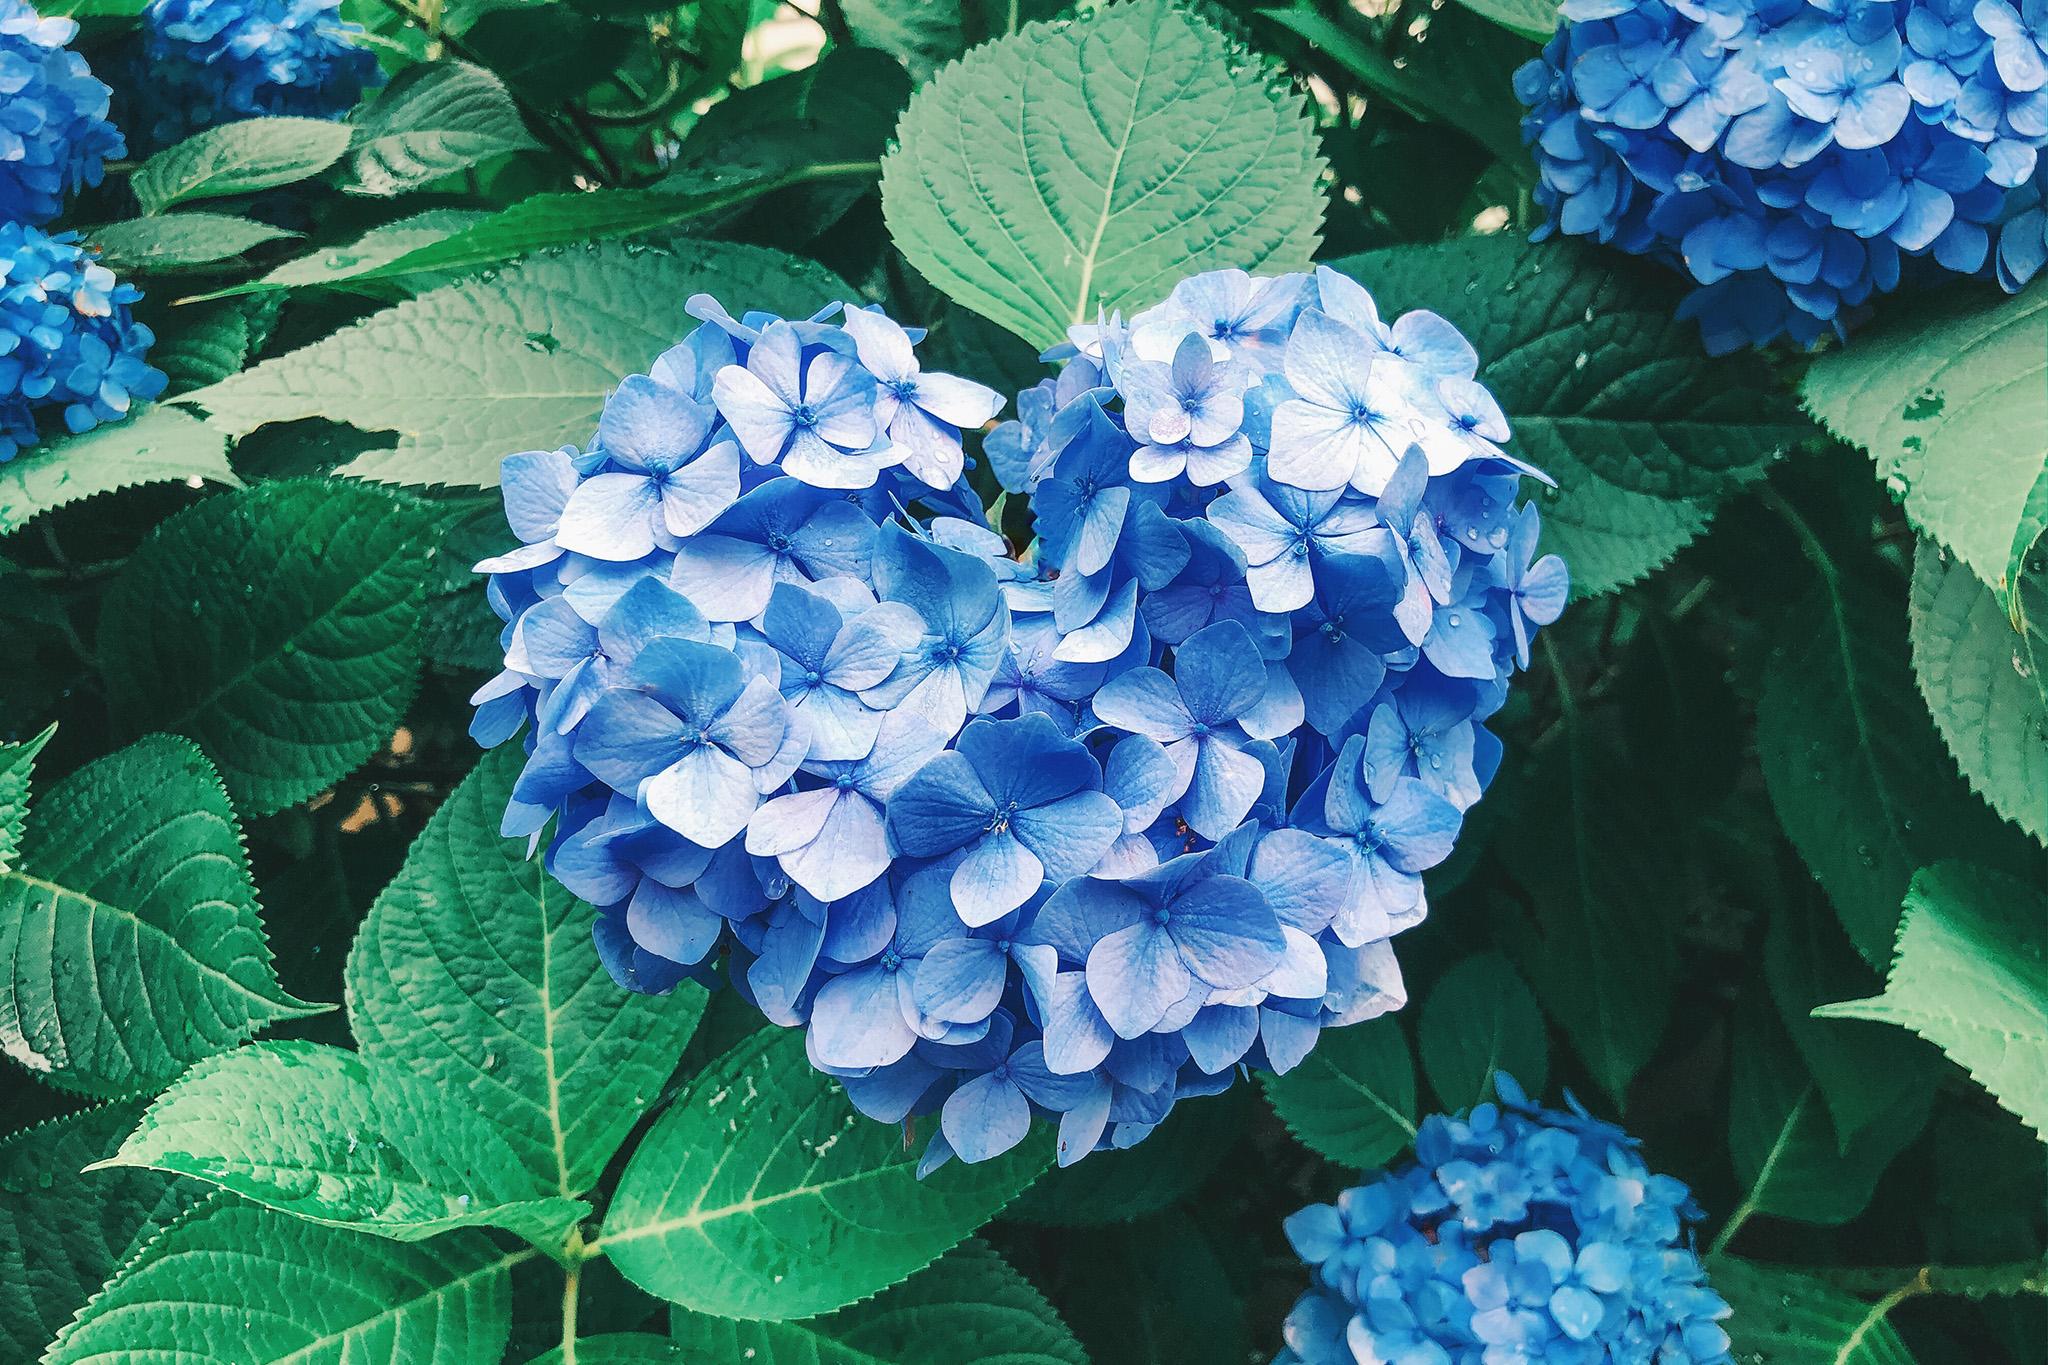 7月23日(木祝)ヨル撮 @泉中央駅周辺【⭐️満枠御礼⭐️】